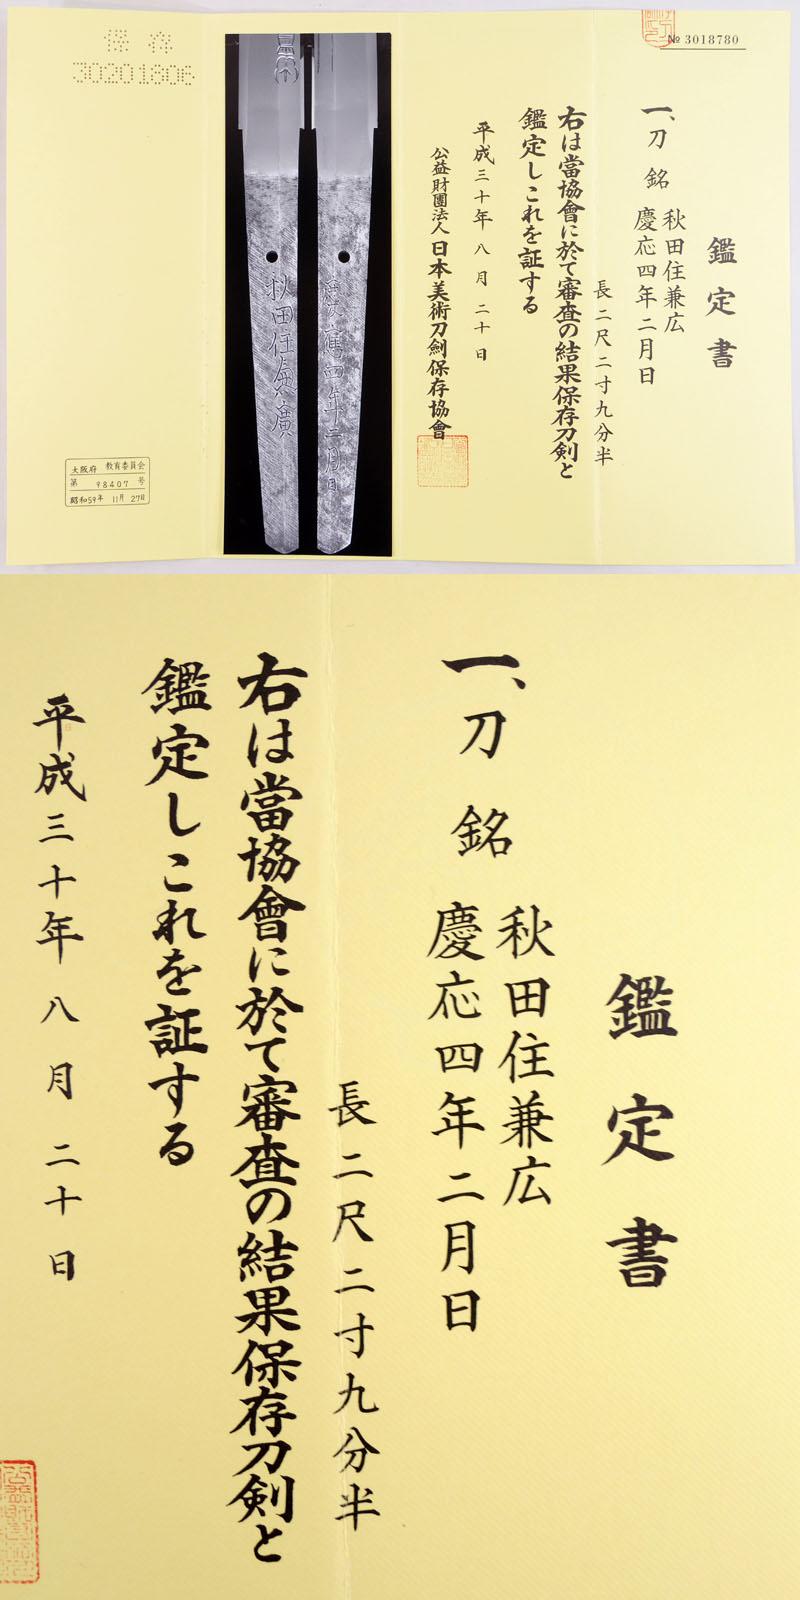 秋田住兼広 Picture of Certificate